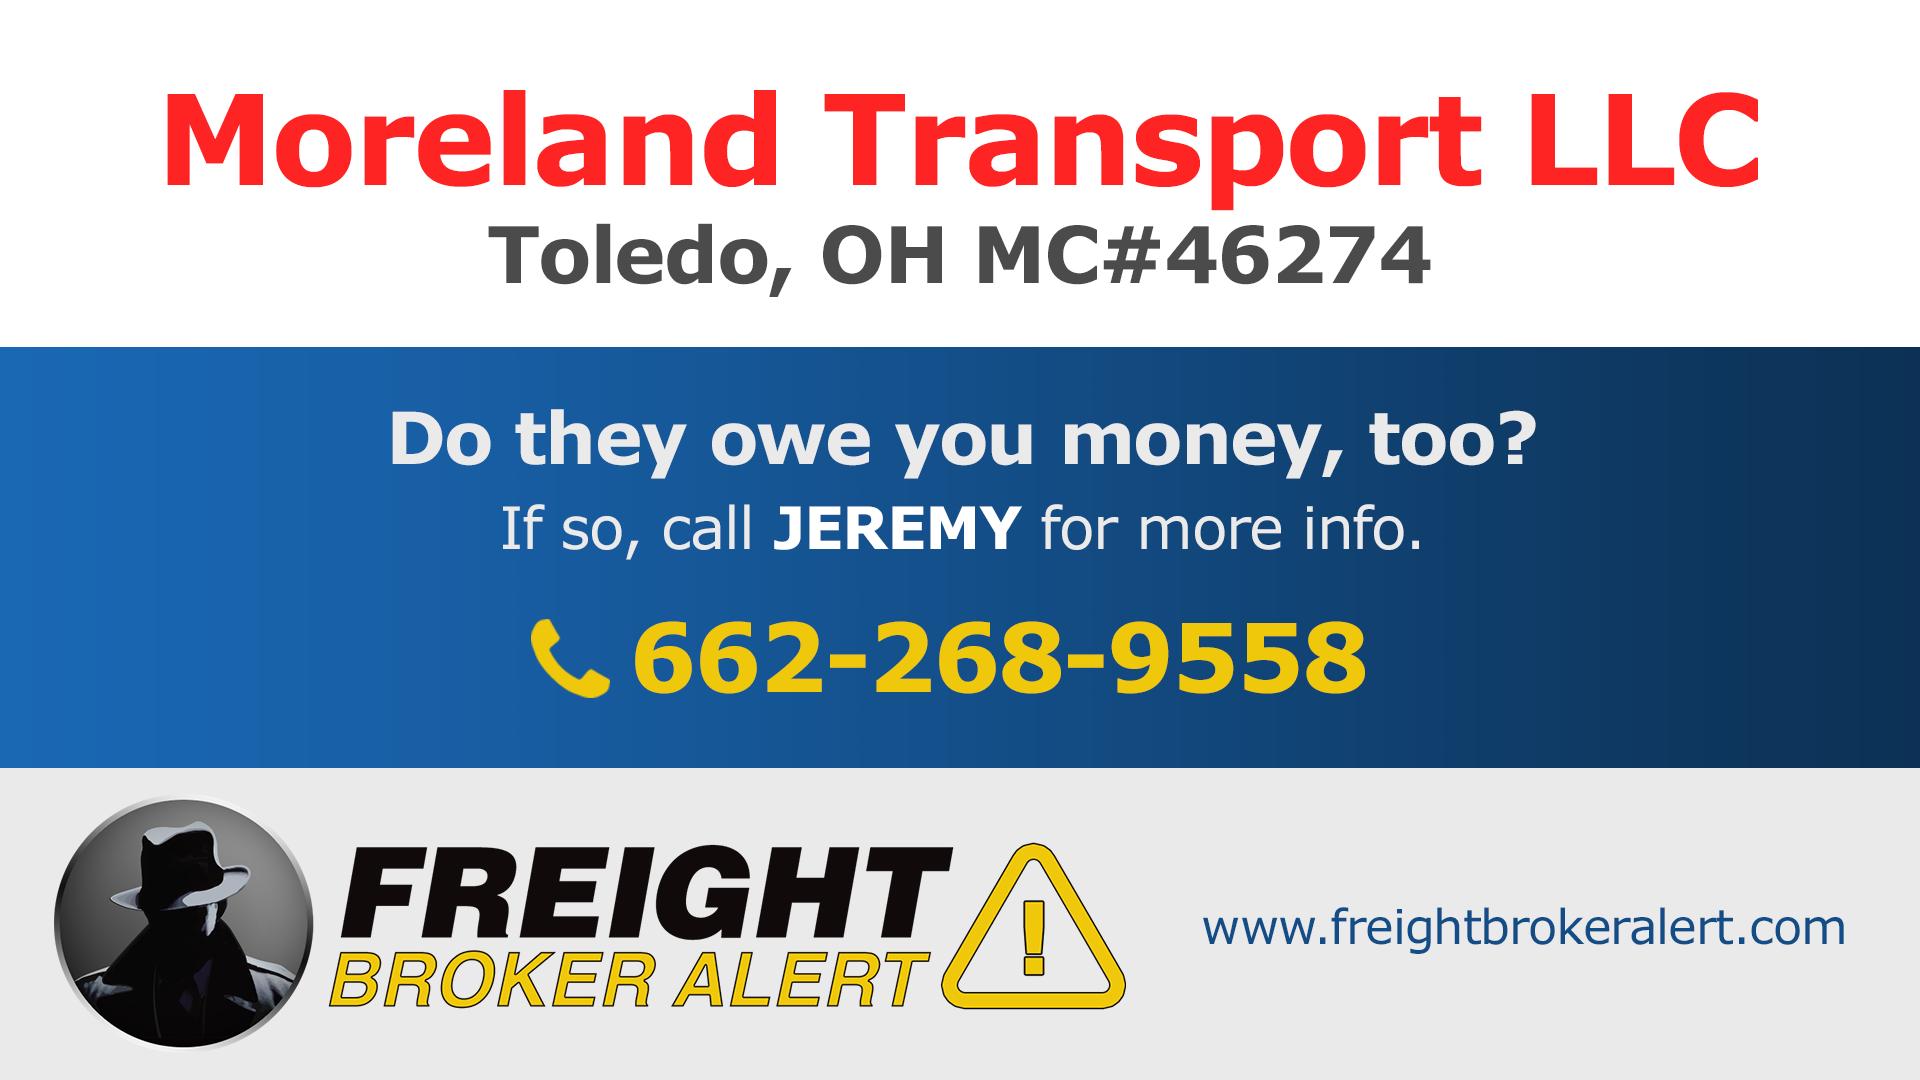 Moreland Transport LLC Ohio